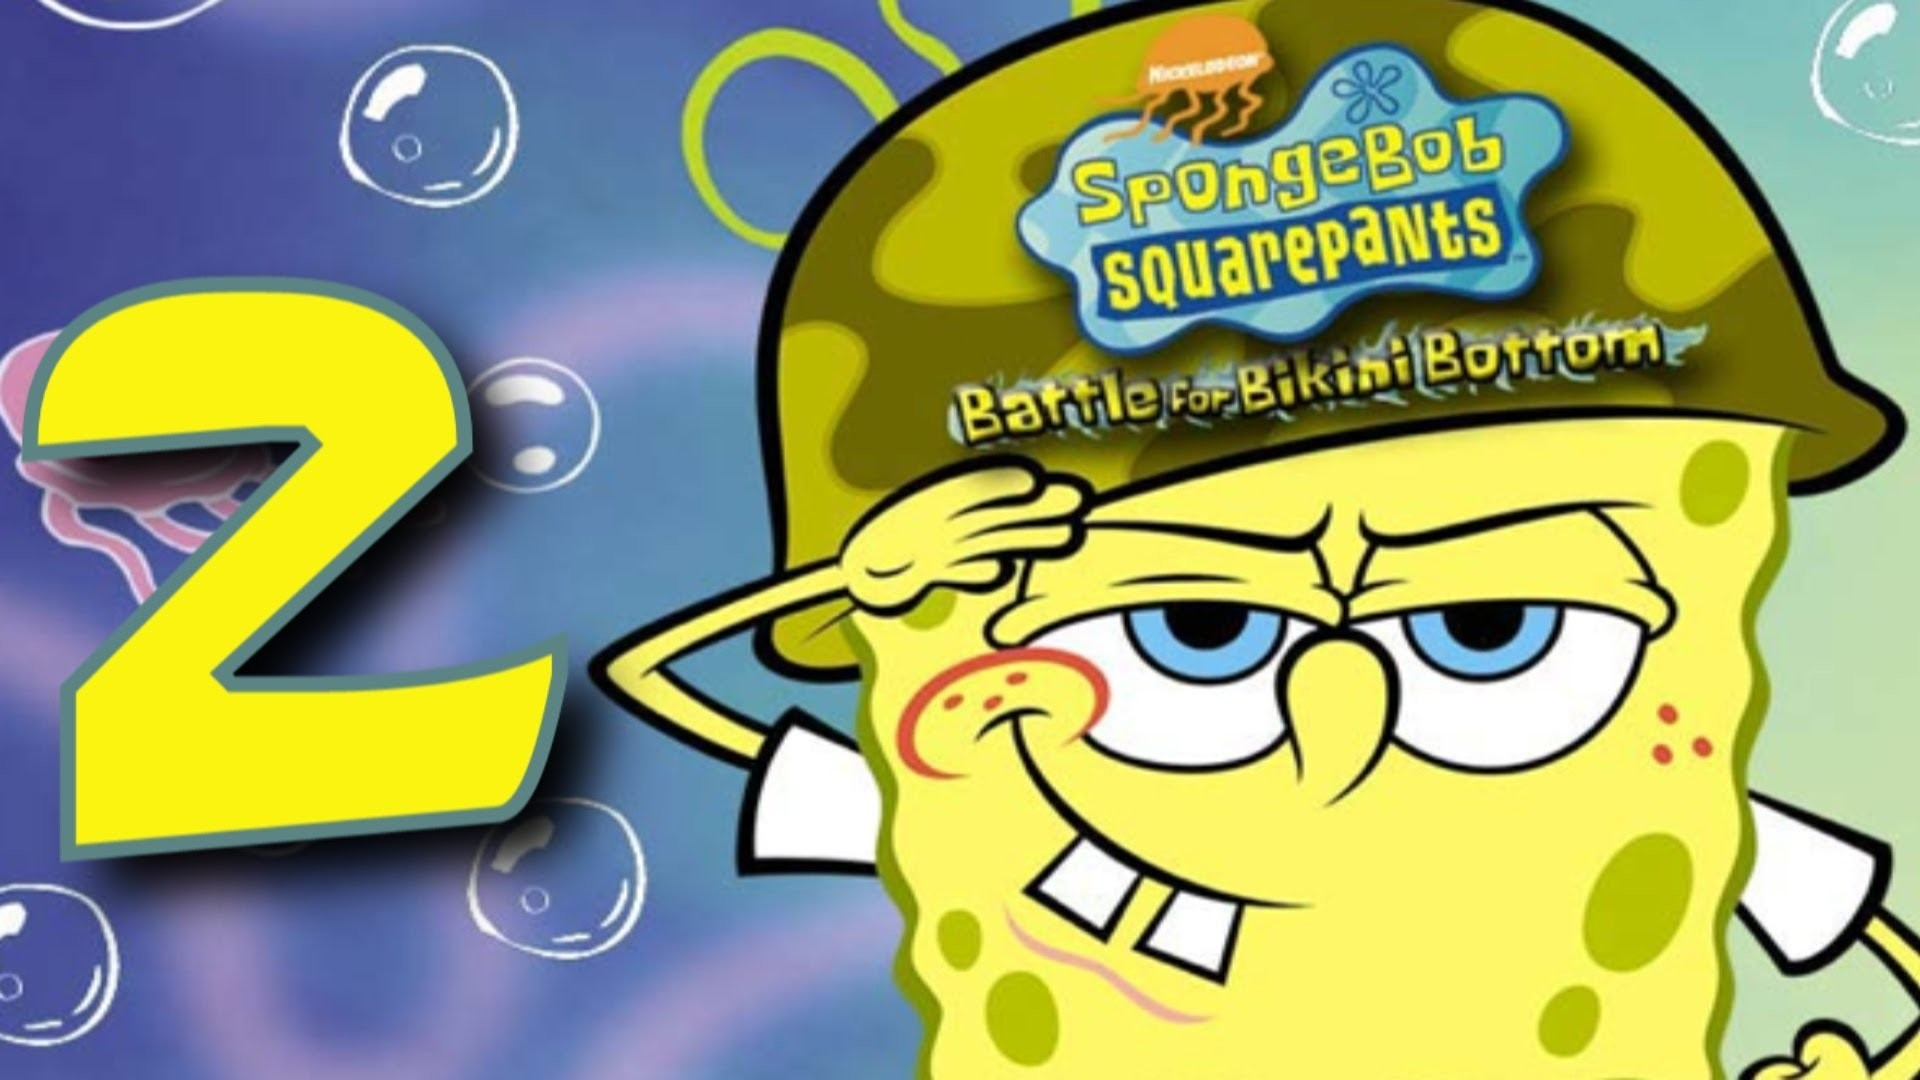 spongebob-squarepants-wallpaper-hd